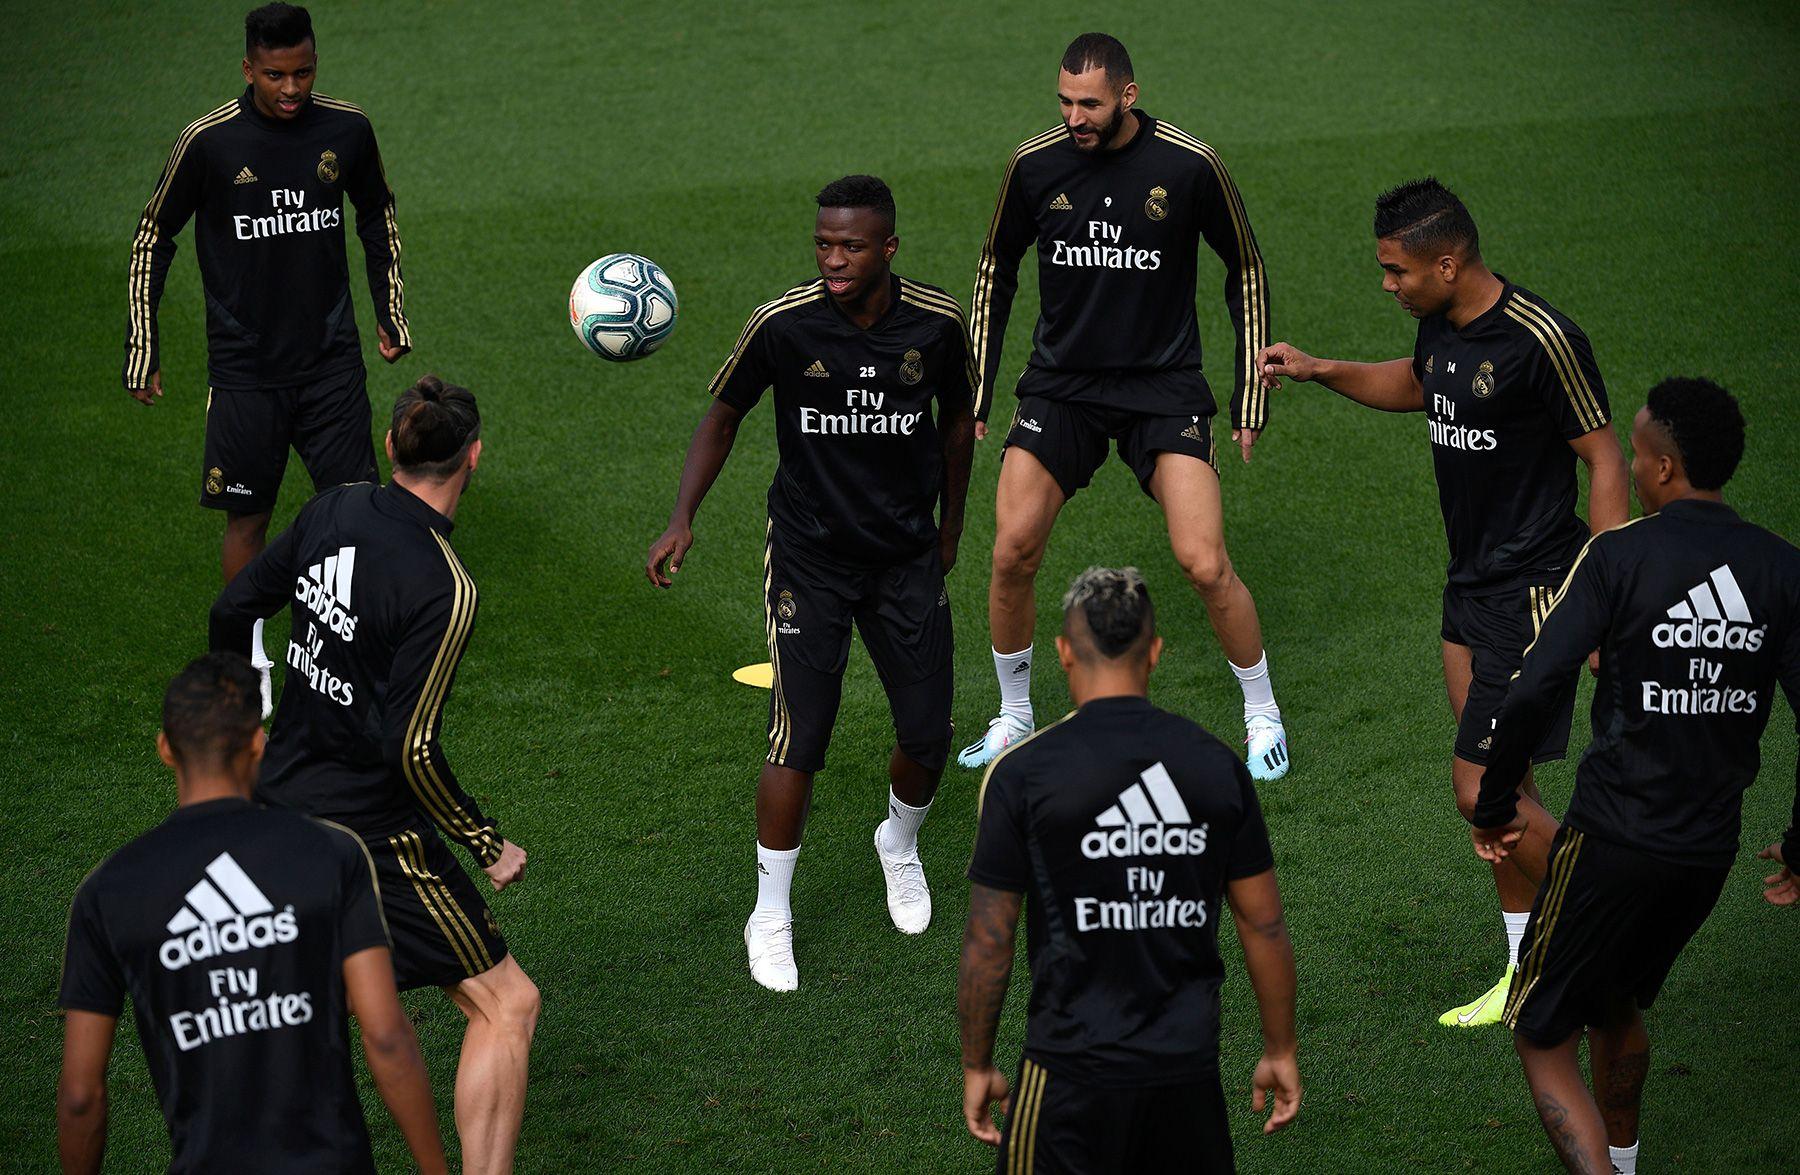 Реал Мадрид, тактика, Йохан Кройфф, Динамо Загреб, Ла Лига, Аякс